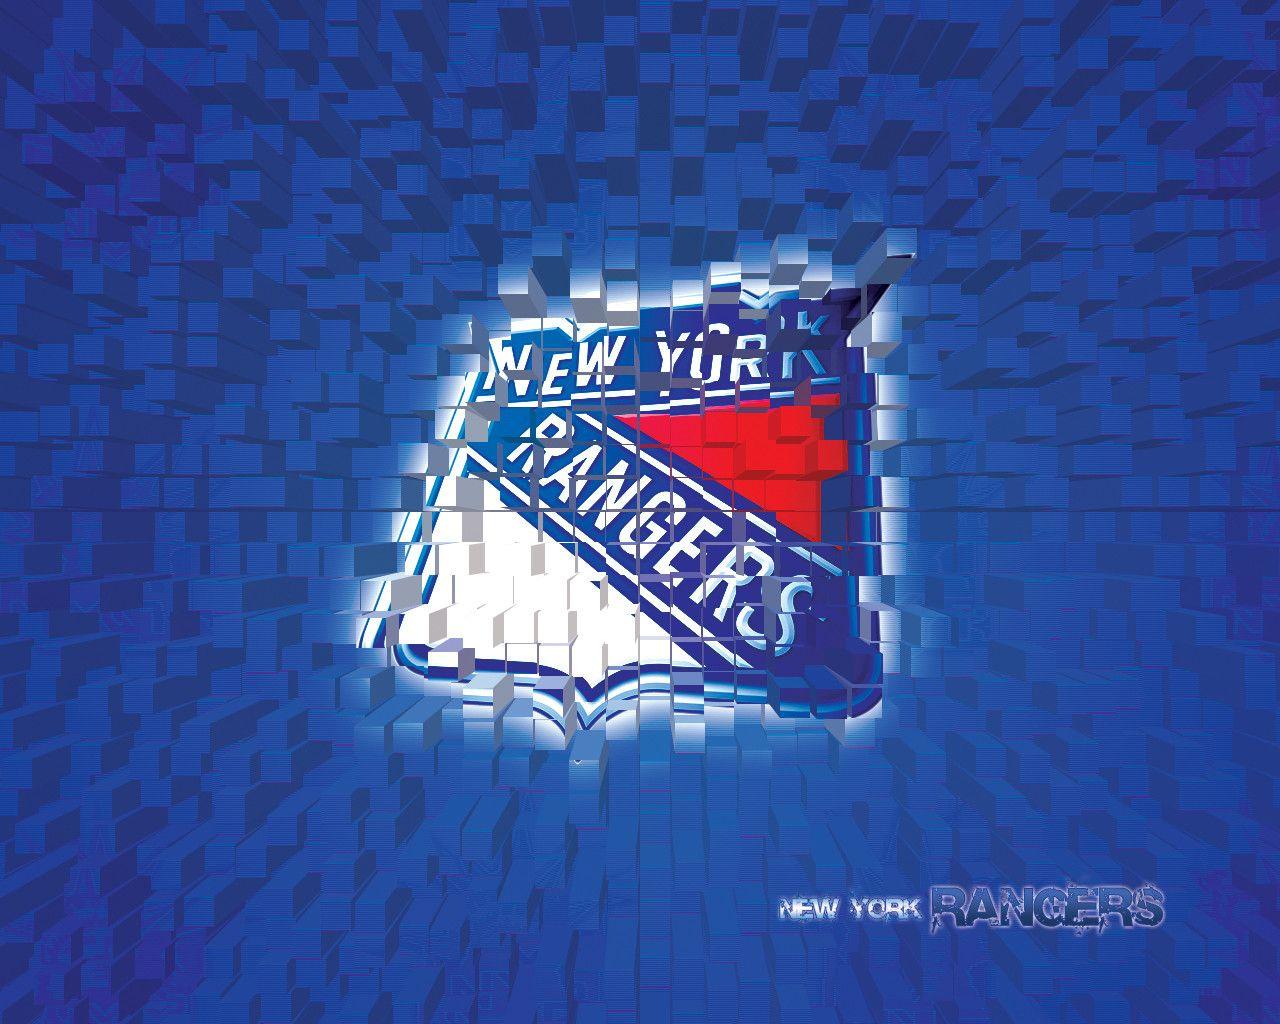 New York Rangers Iphone Wallpaper 64117 Background fullhdimage 1280x1024